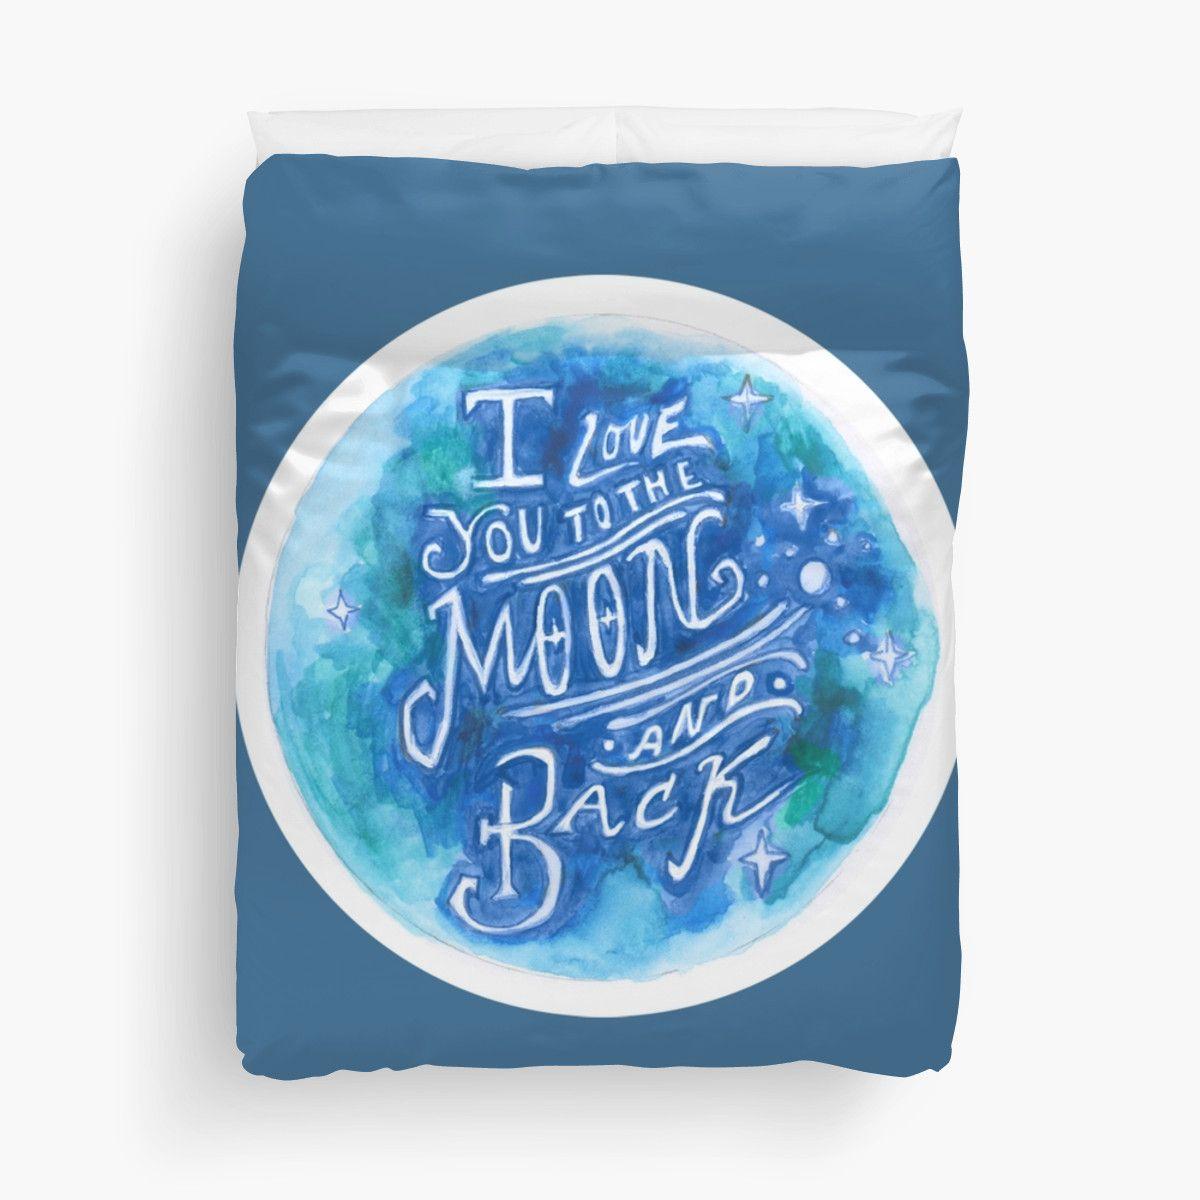 Blue Hand-Lettered Duvet Cover by #SarahVanRose for sale on #Redbubble